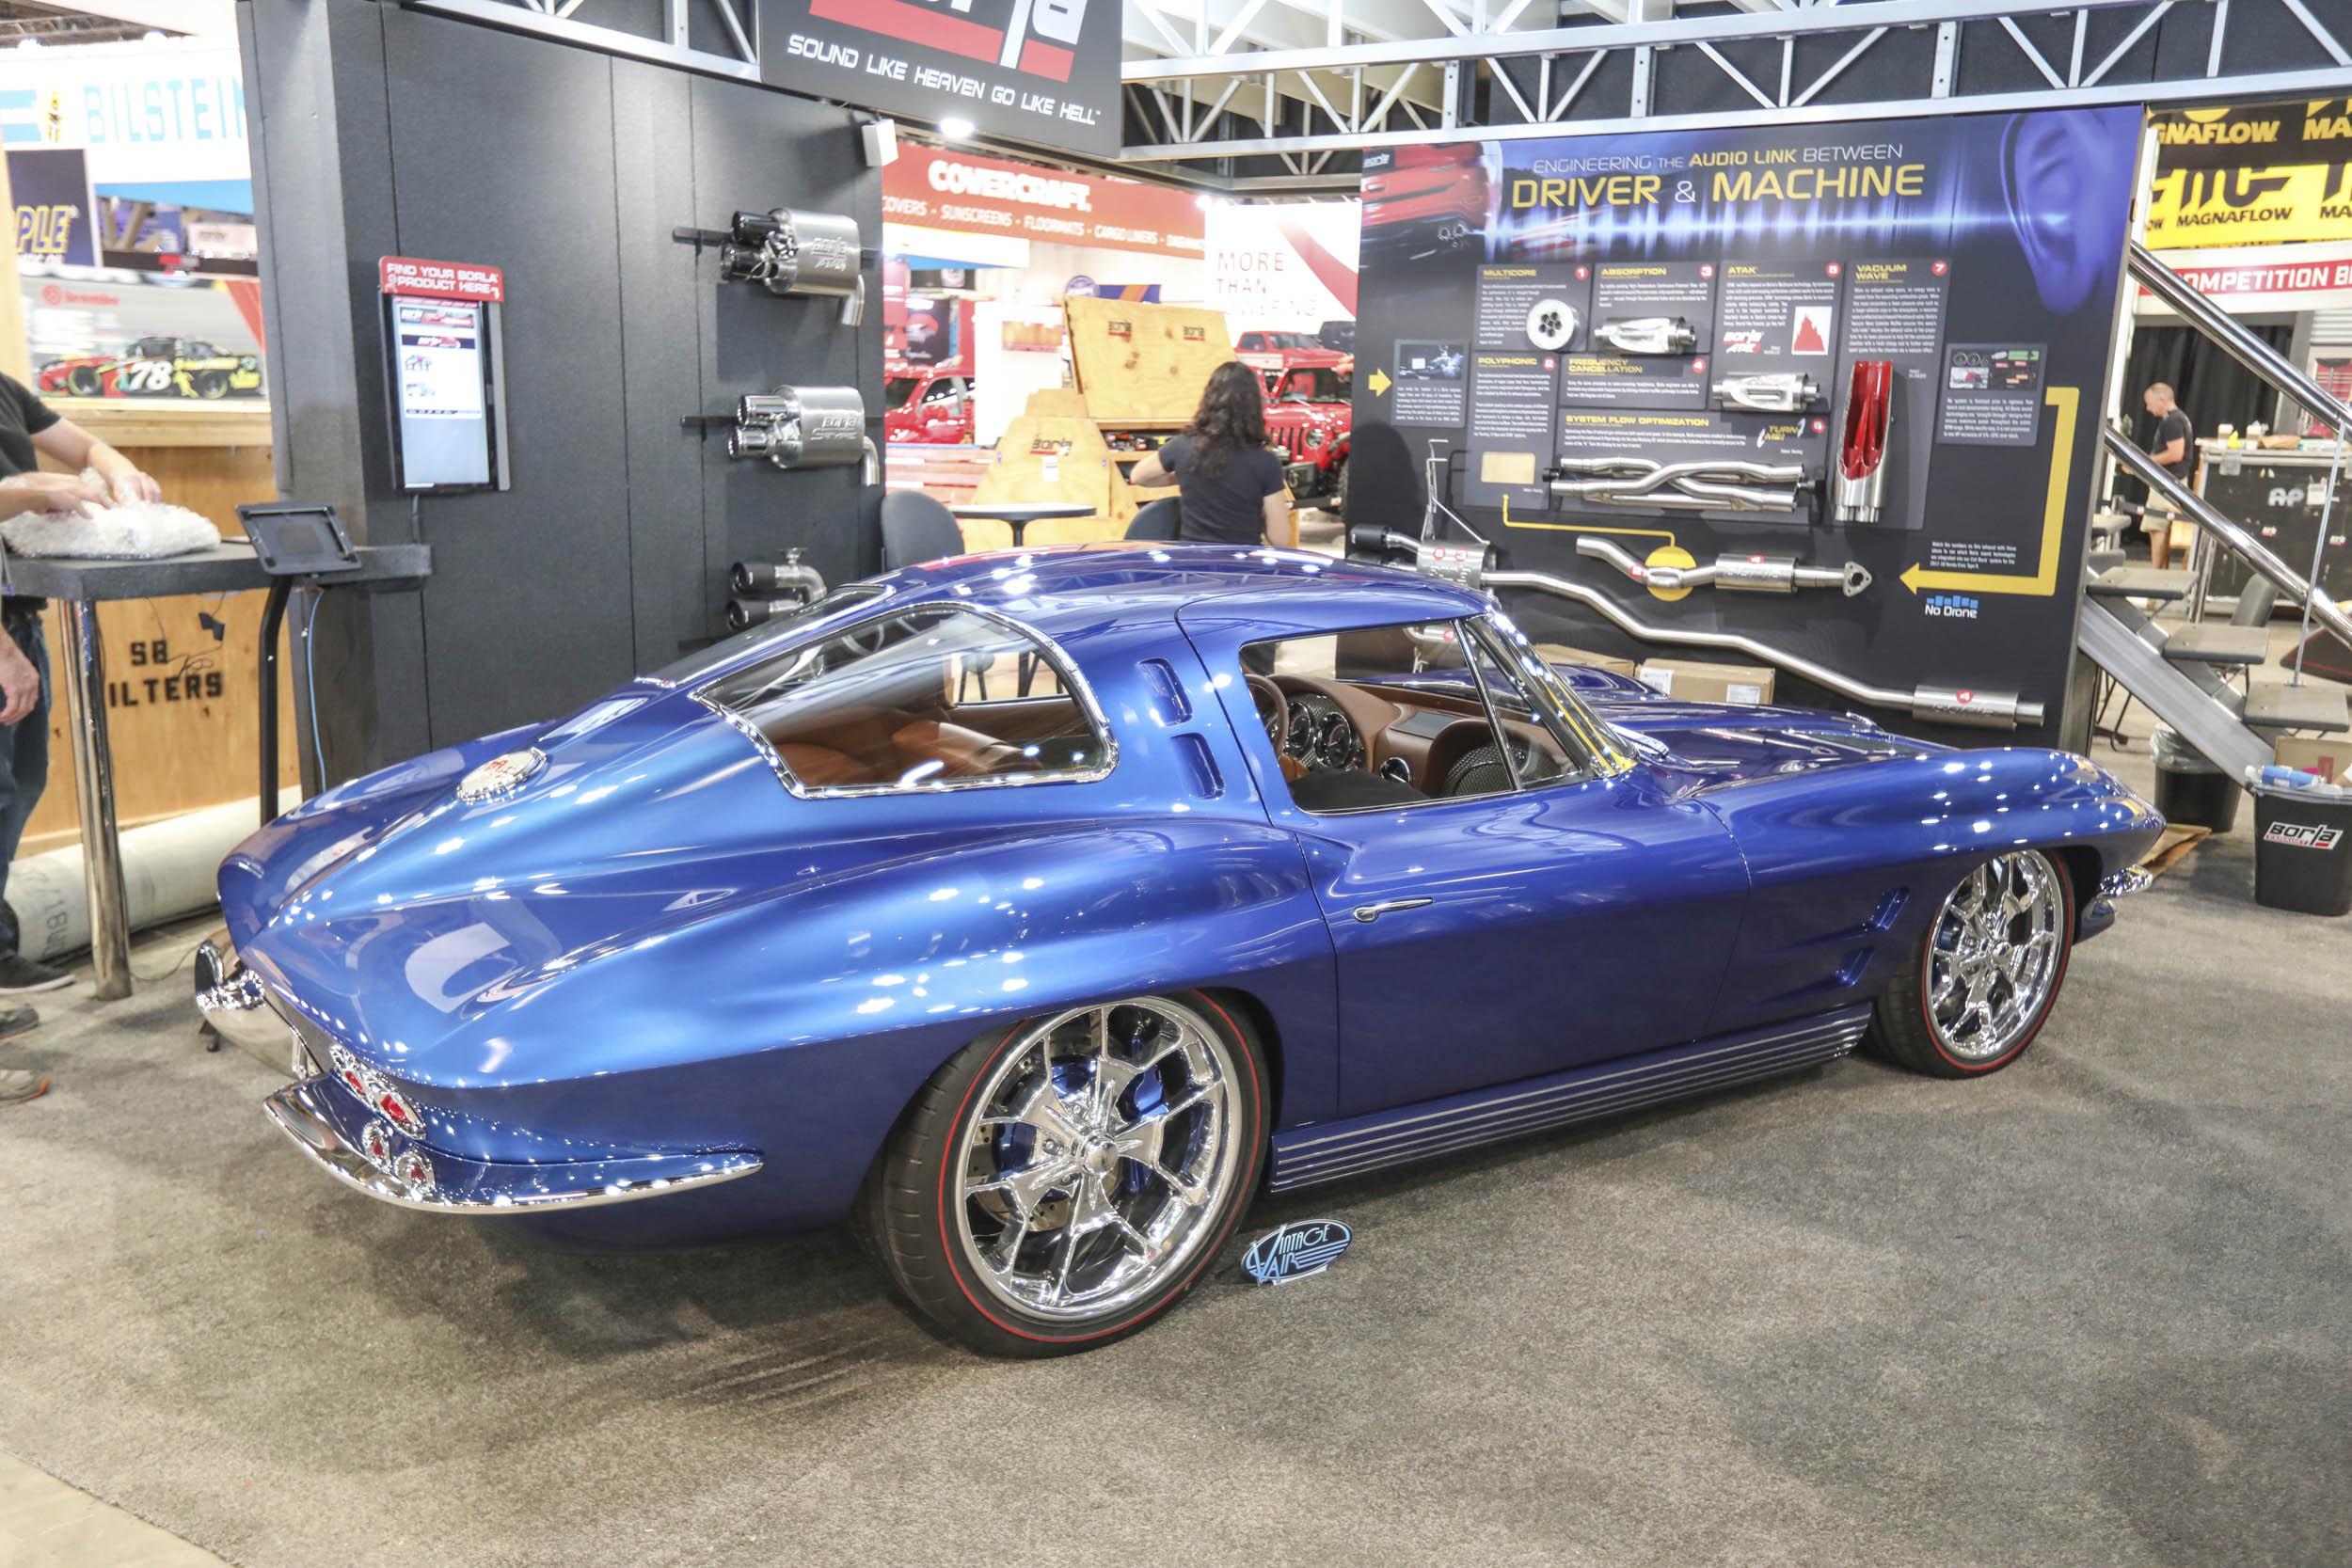 Custom split window Corvette at SEMA